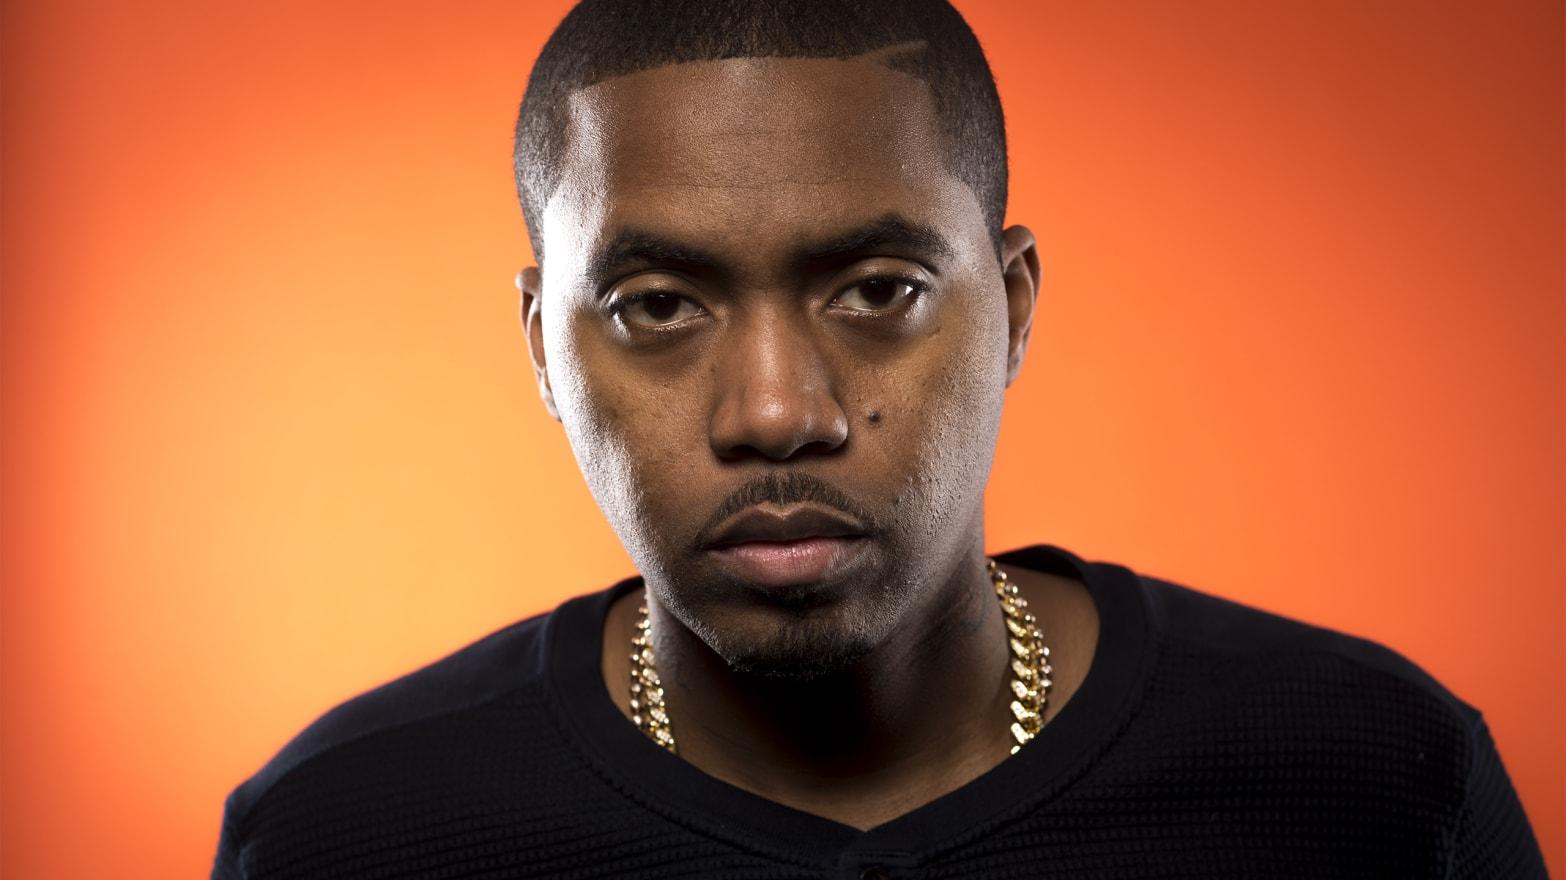 The Life of Nas: Hip-Hop Legend Turned Ace Venture Capitalist